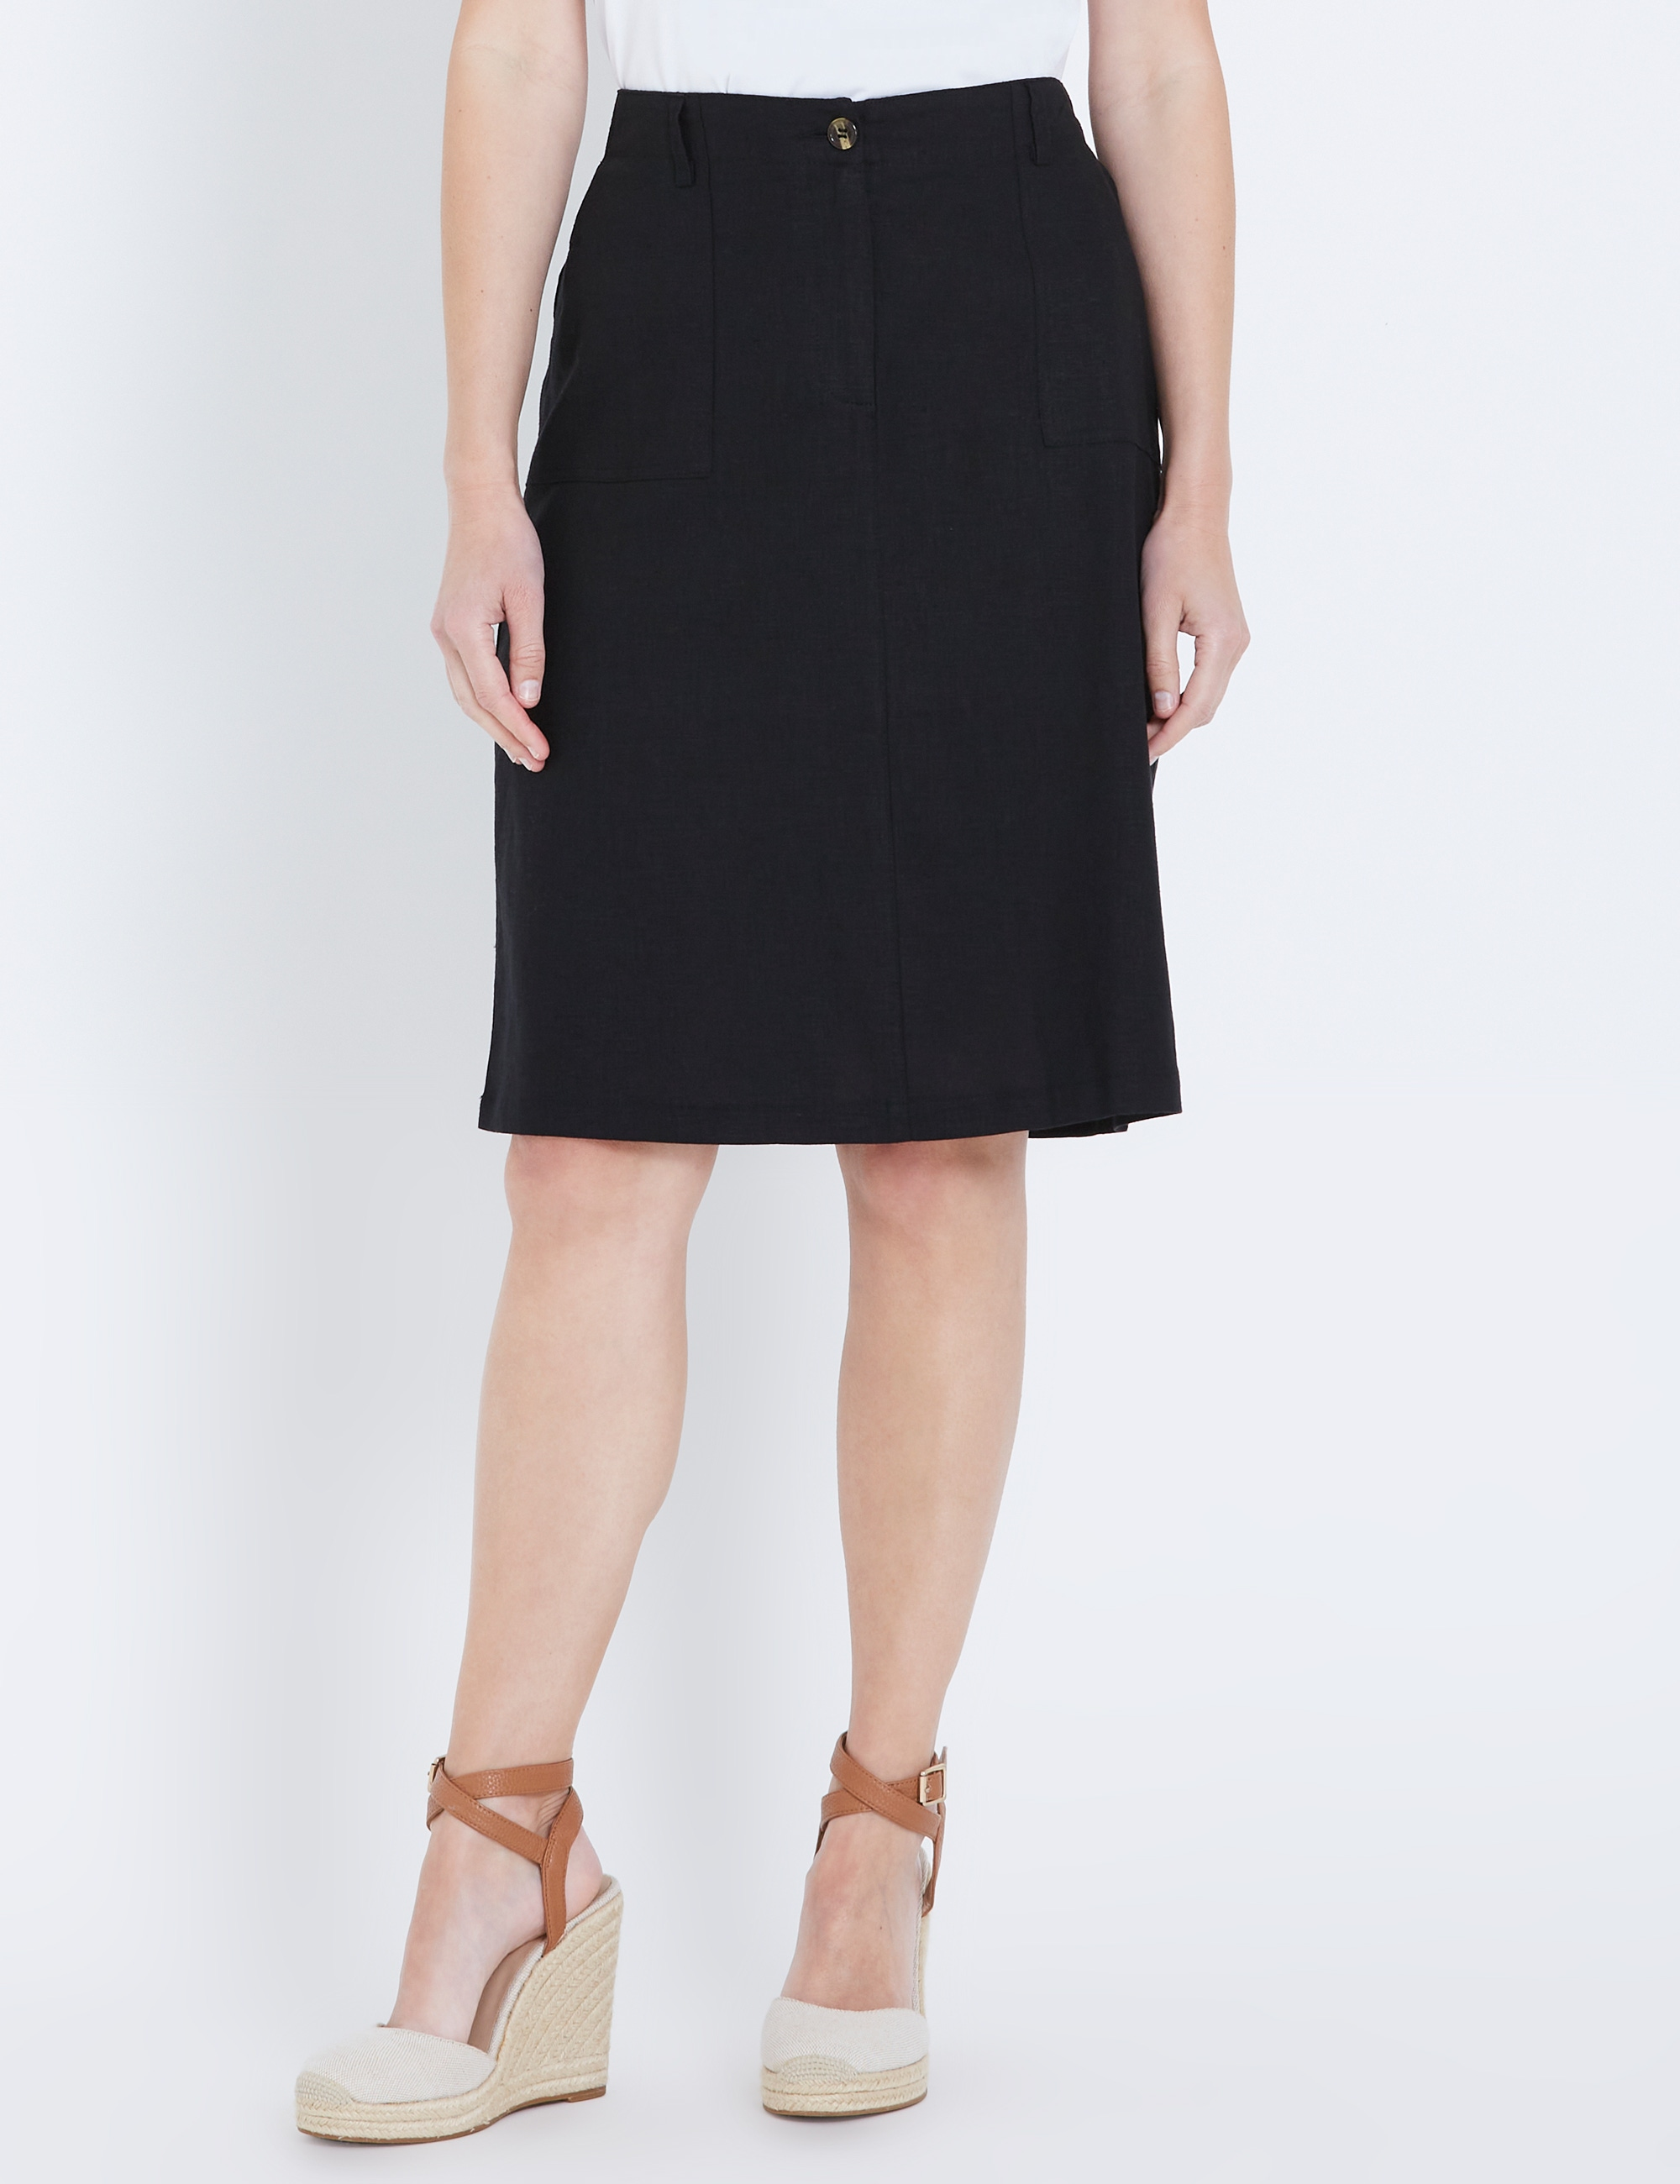 1055112001 1 - Women Fashion